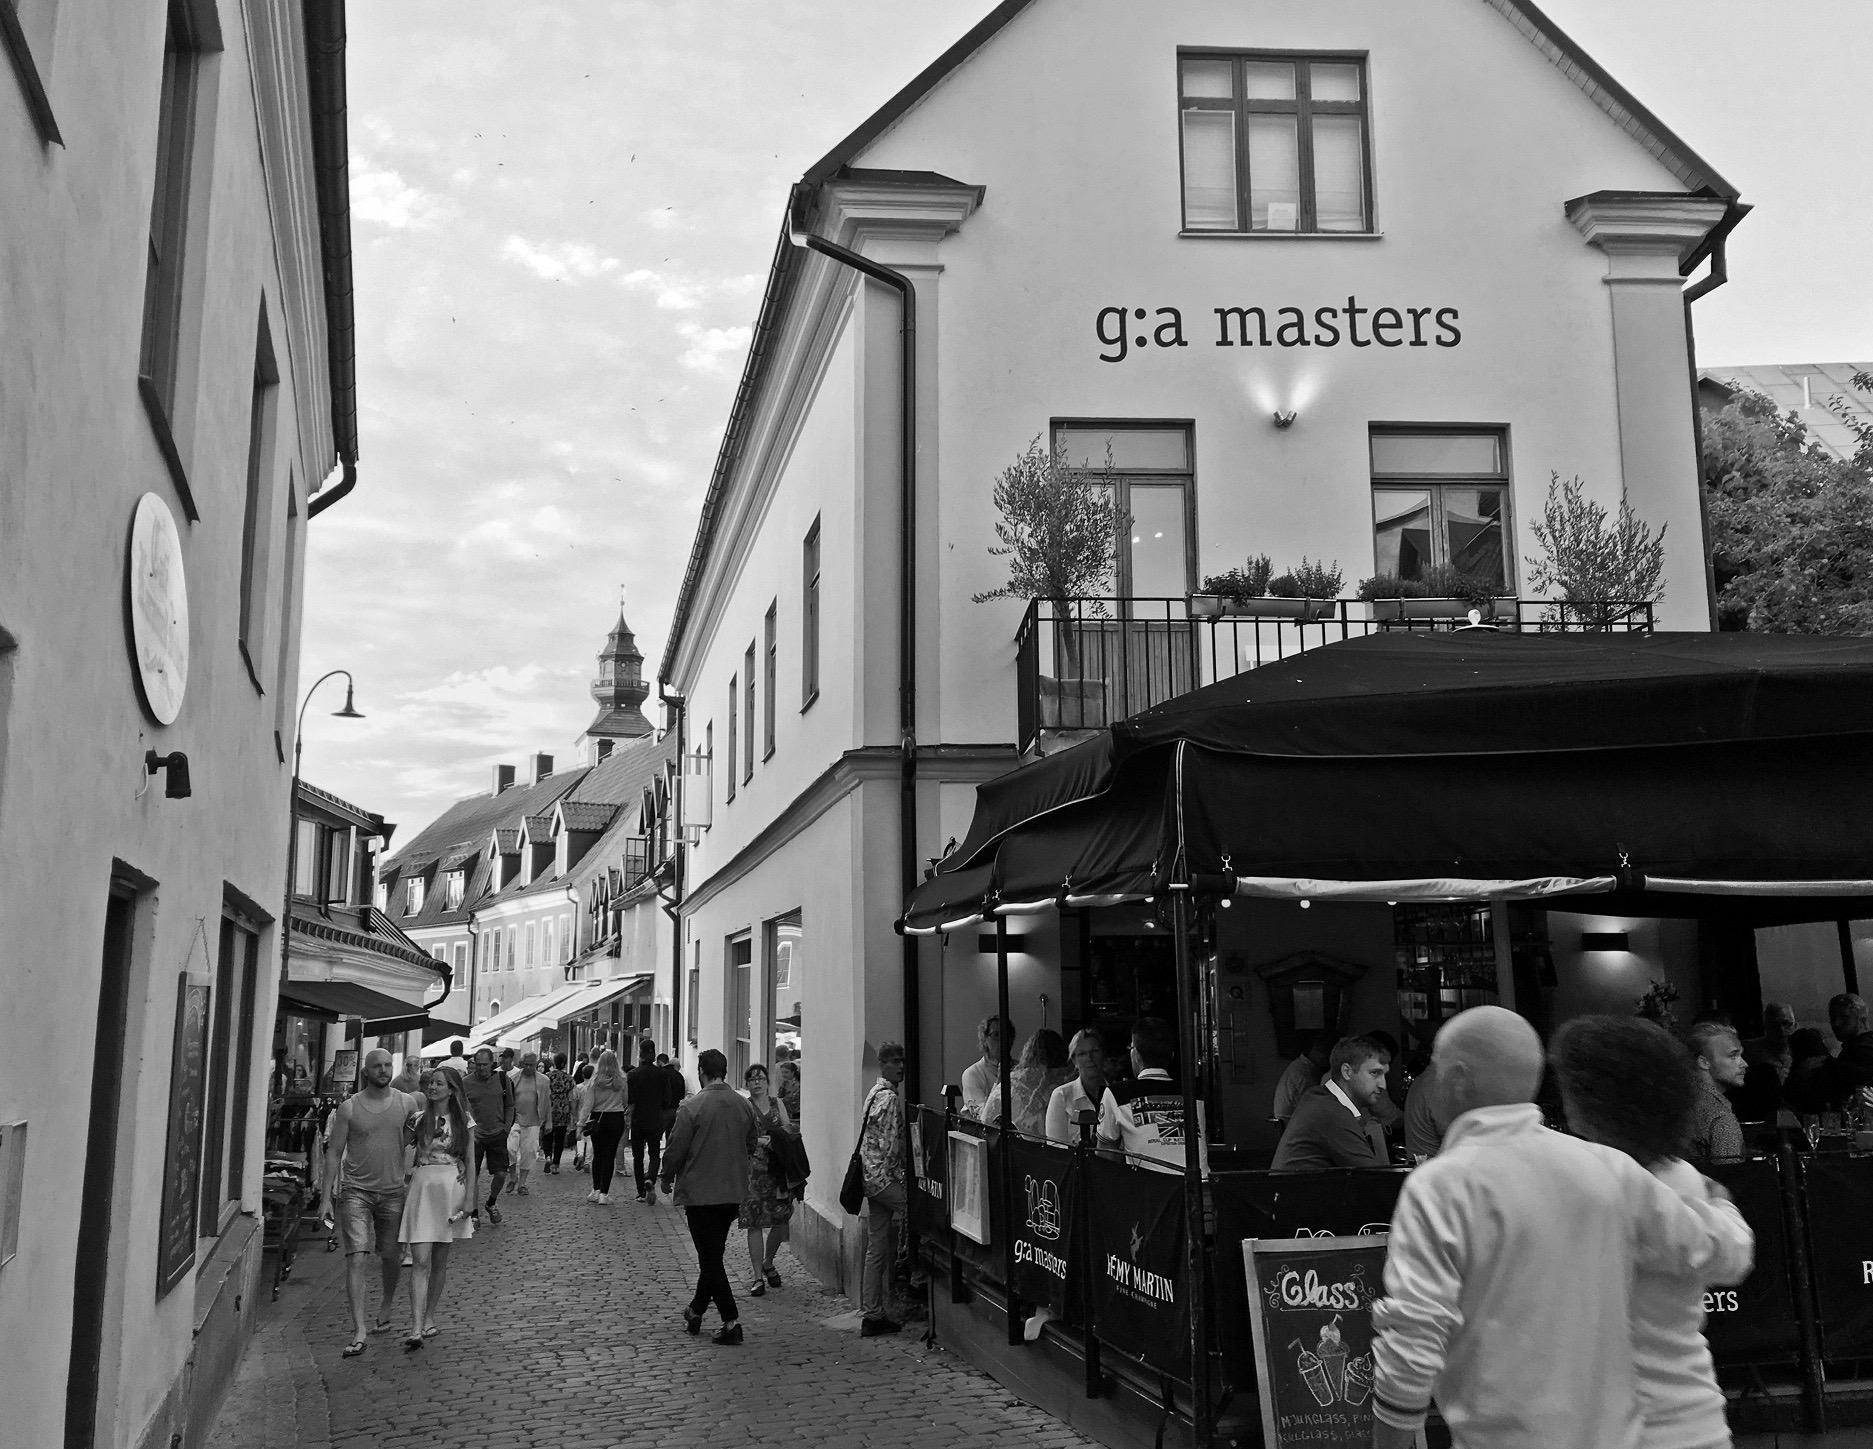 Gamla Masters 8 (1).jpg